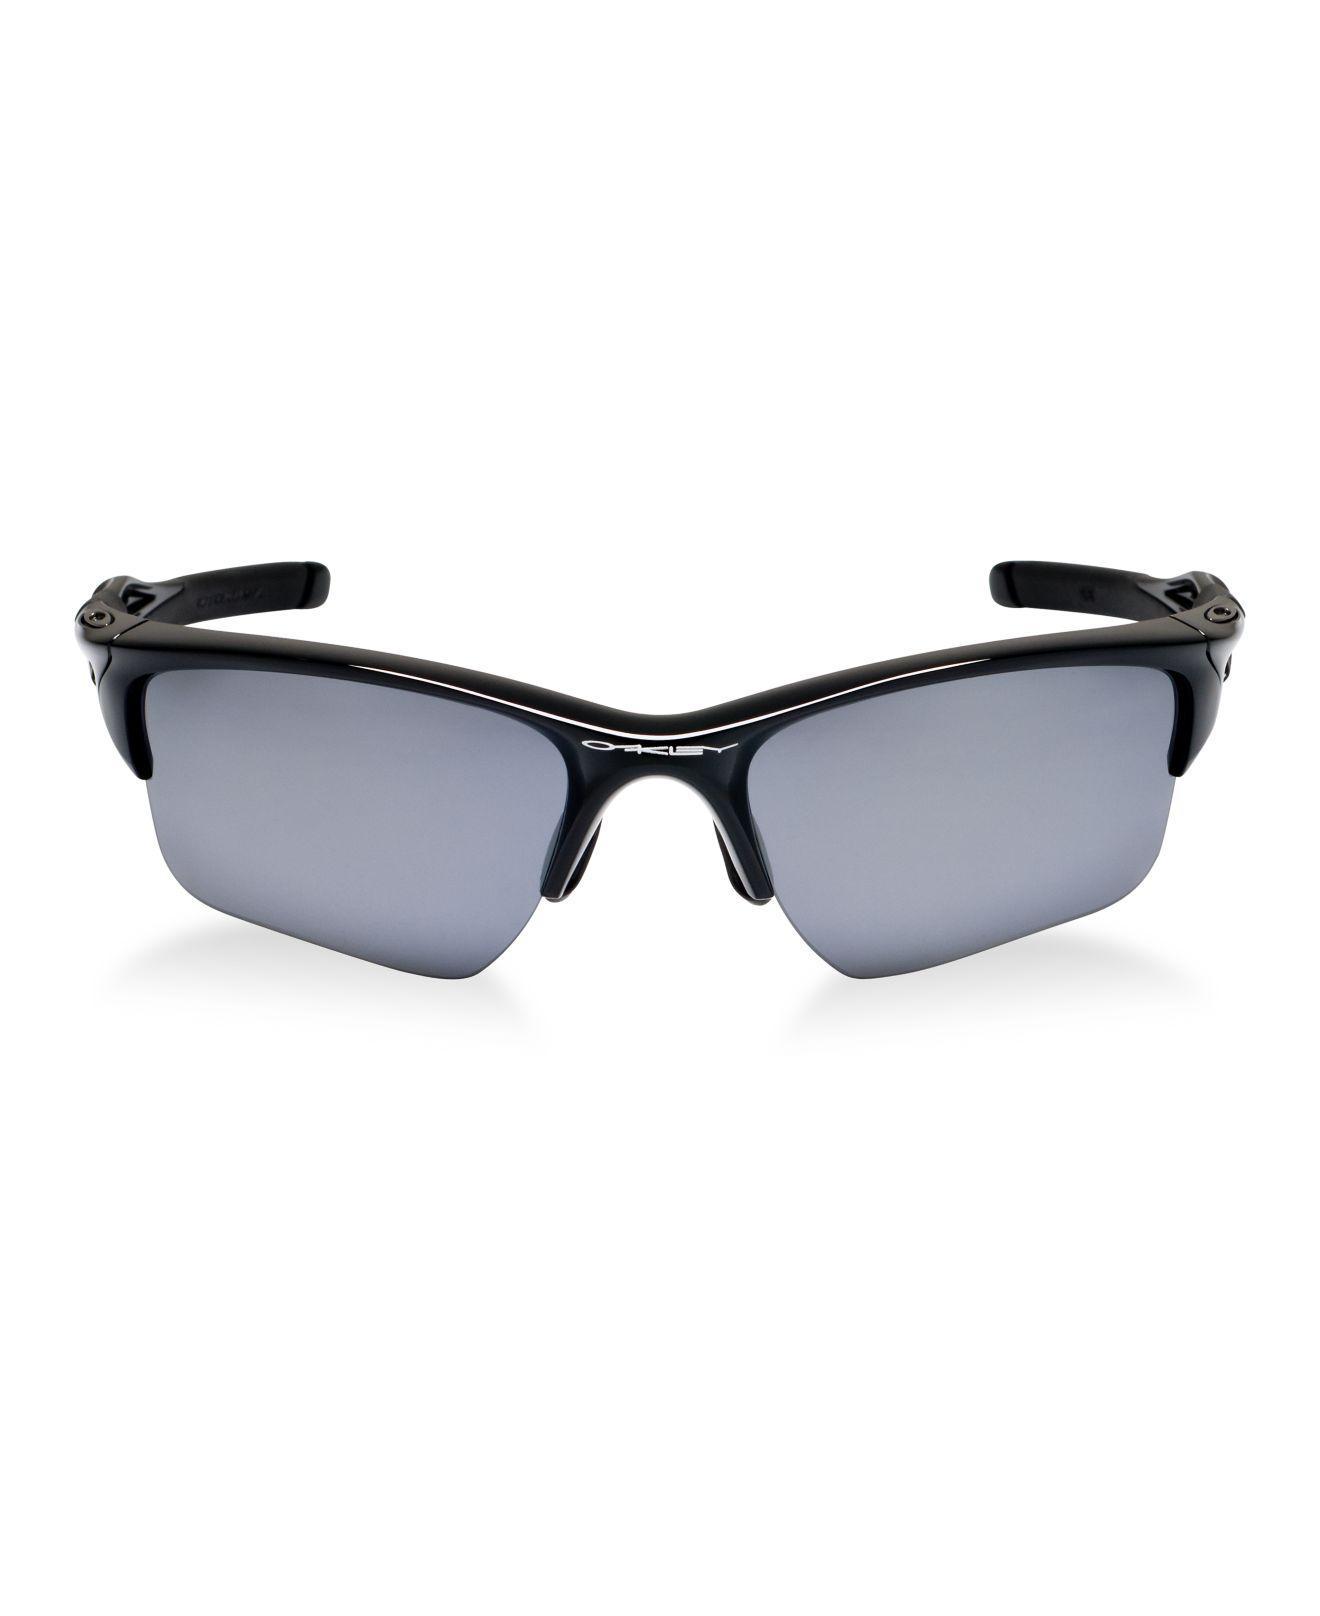 2f11388f0d8 Lyst - Oakley Sunglasses